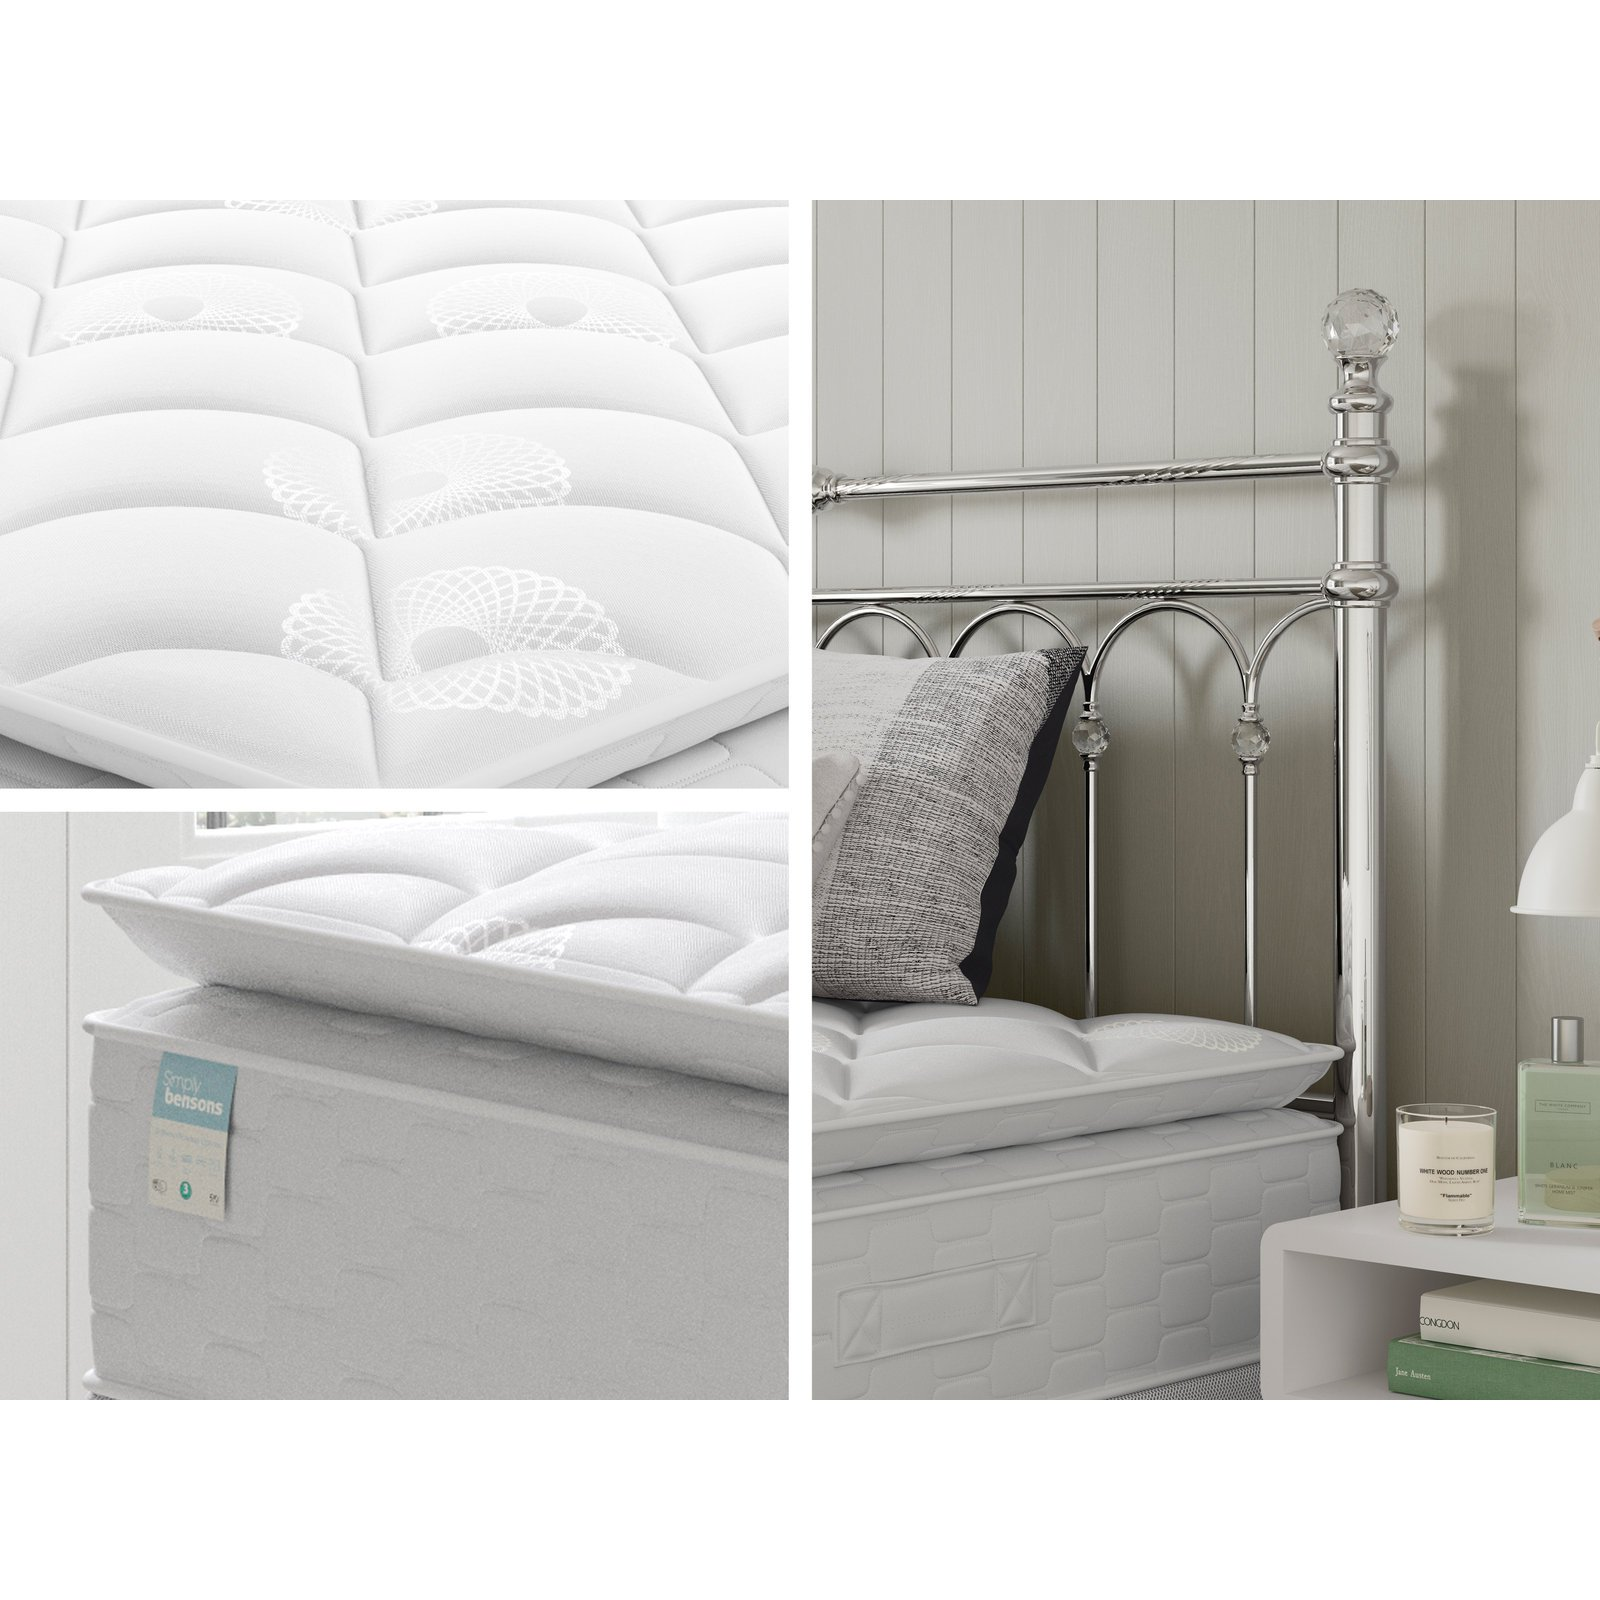 image-Simply Bensons Rafferty Options Pillow Top Divan Bed Set